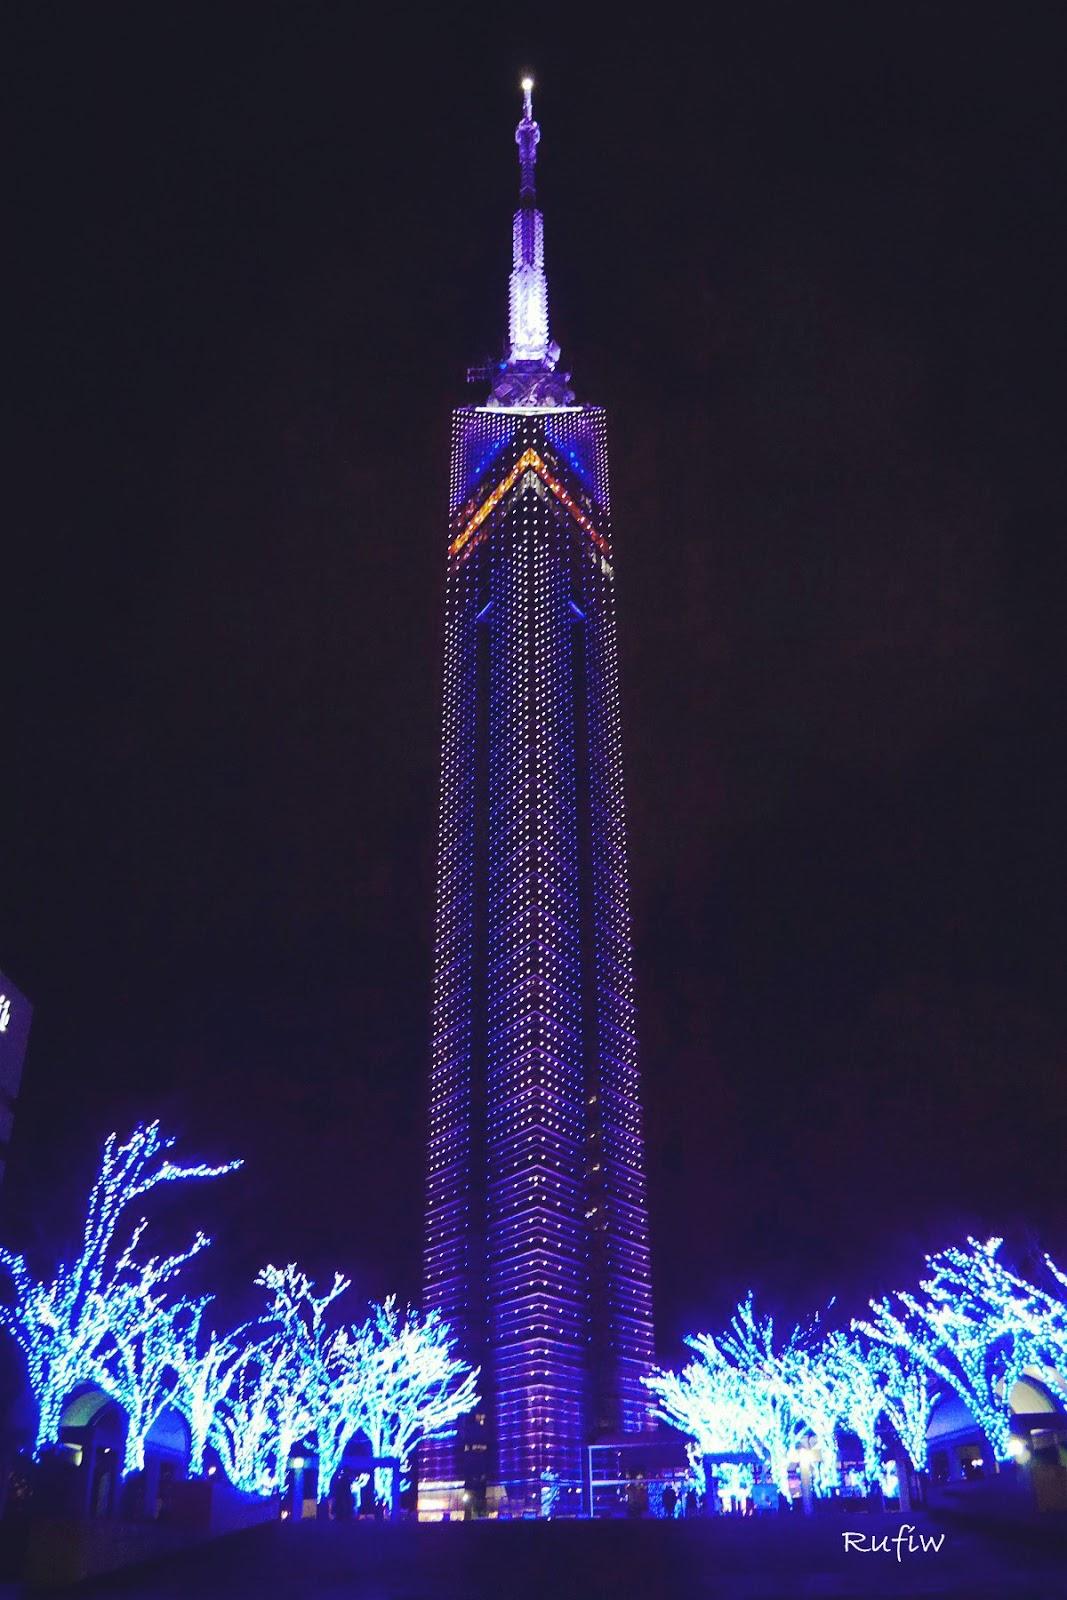 夜景~福岡塔 (福岡タワー)@Rufiw (9467) - 旅行酒吧